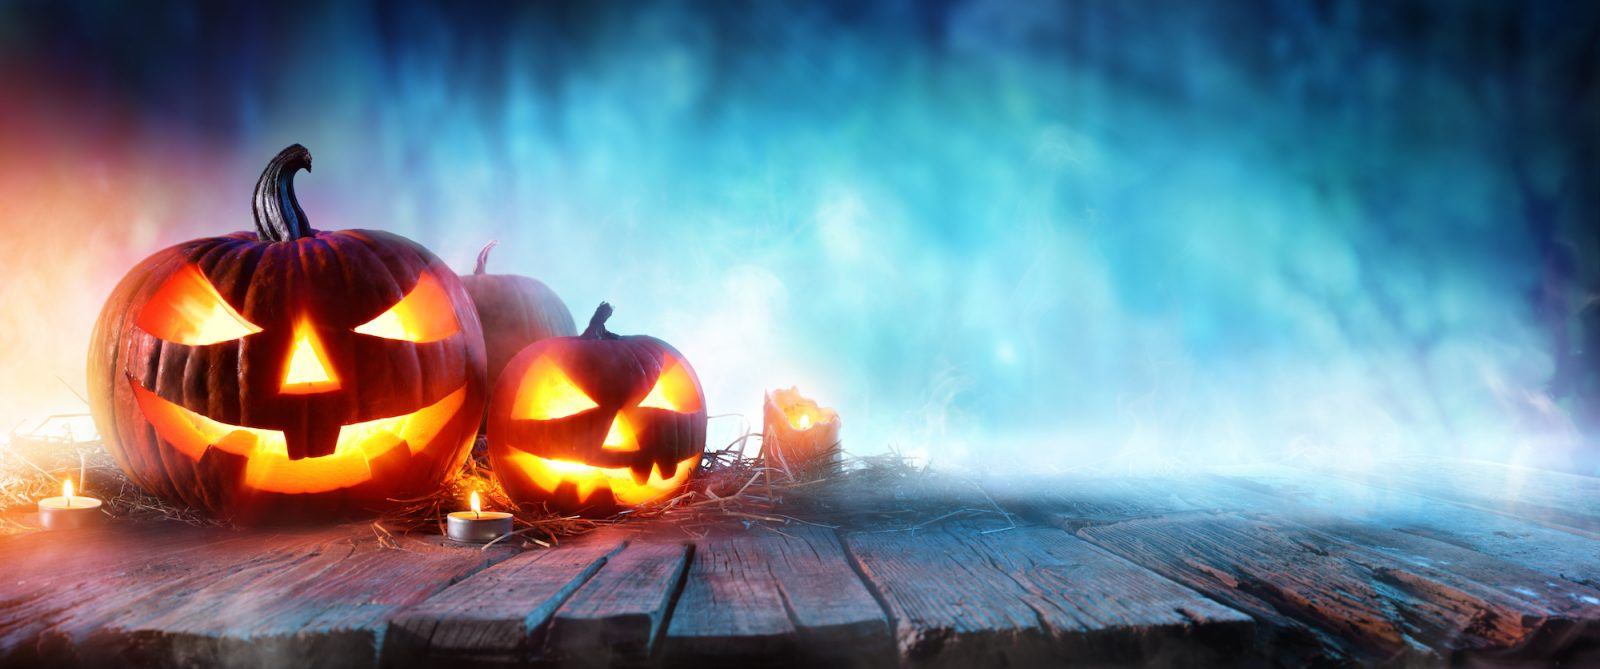 rituales en la noche de halloween